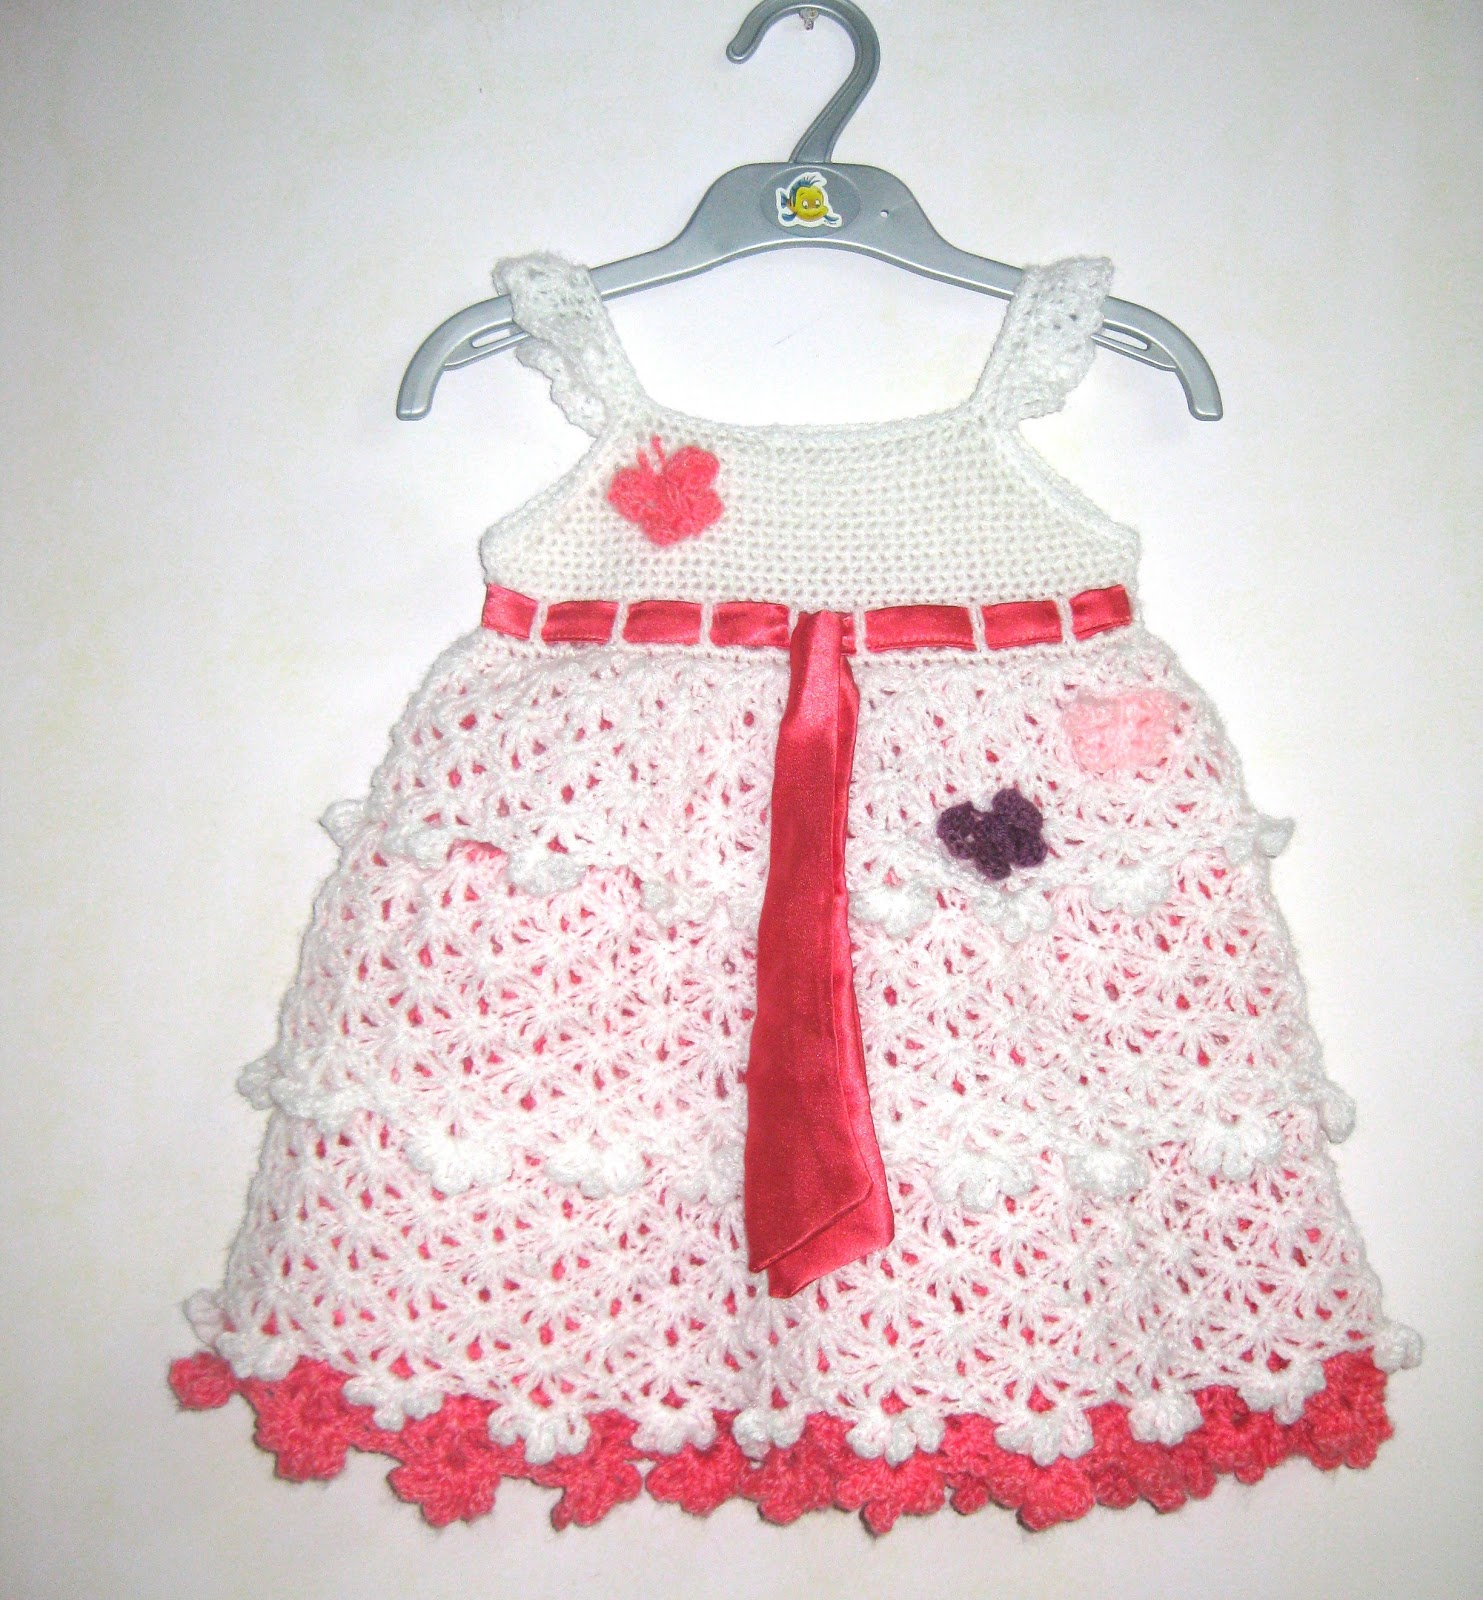 Wel e Winter Crocheted Baby Dress Savannah Belle